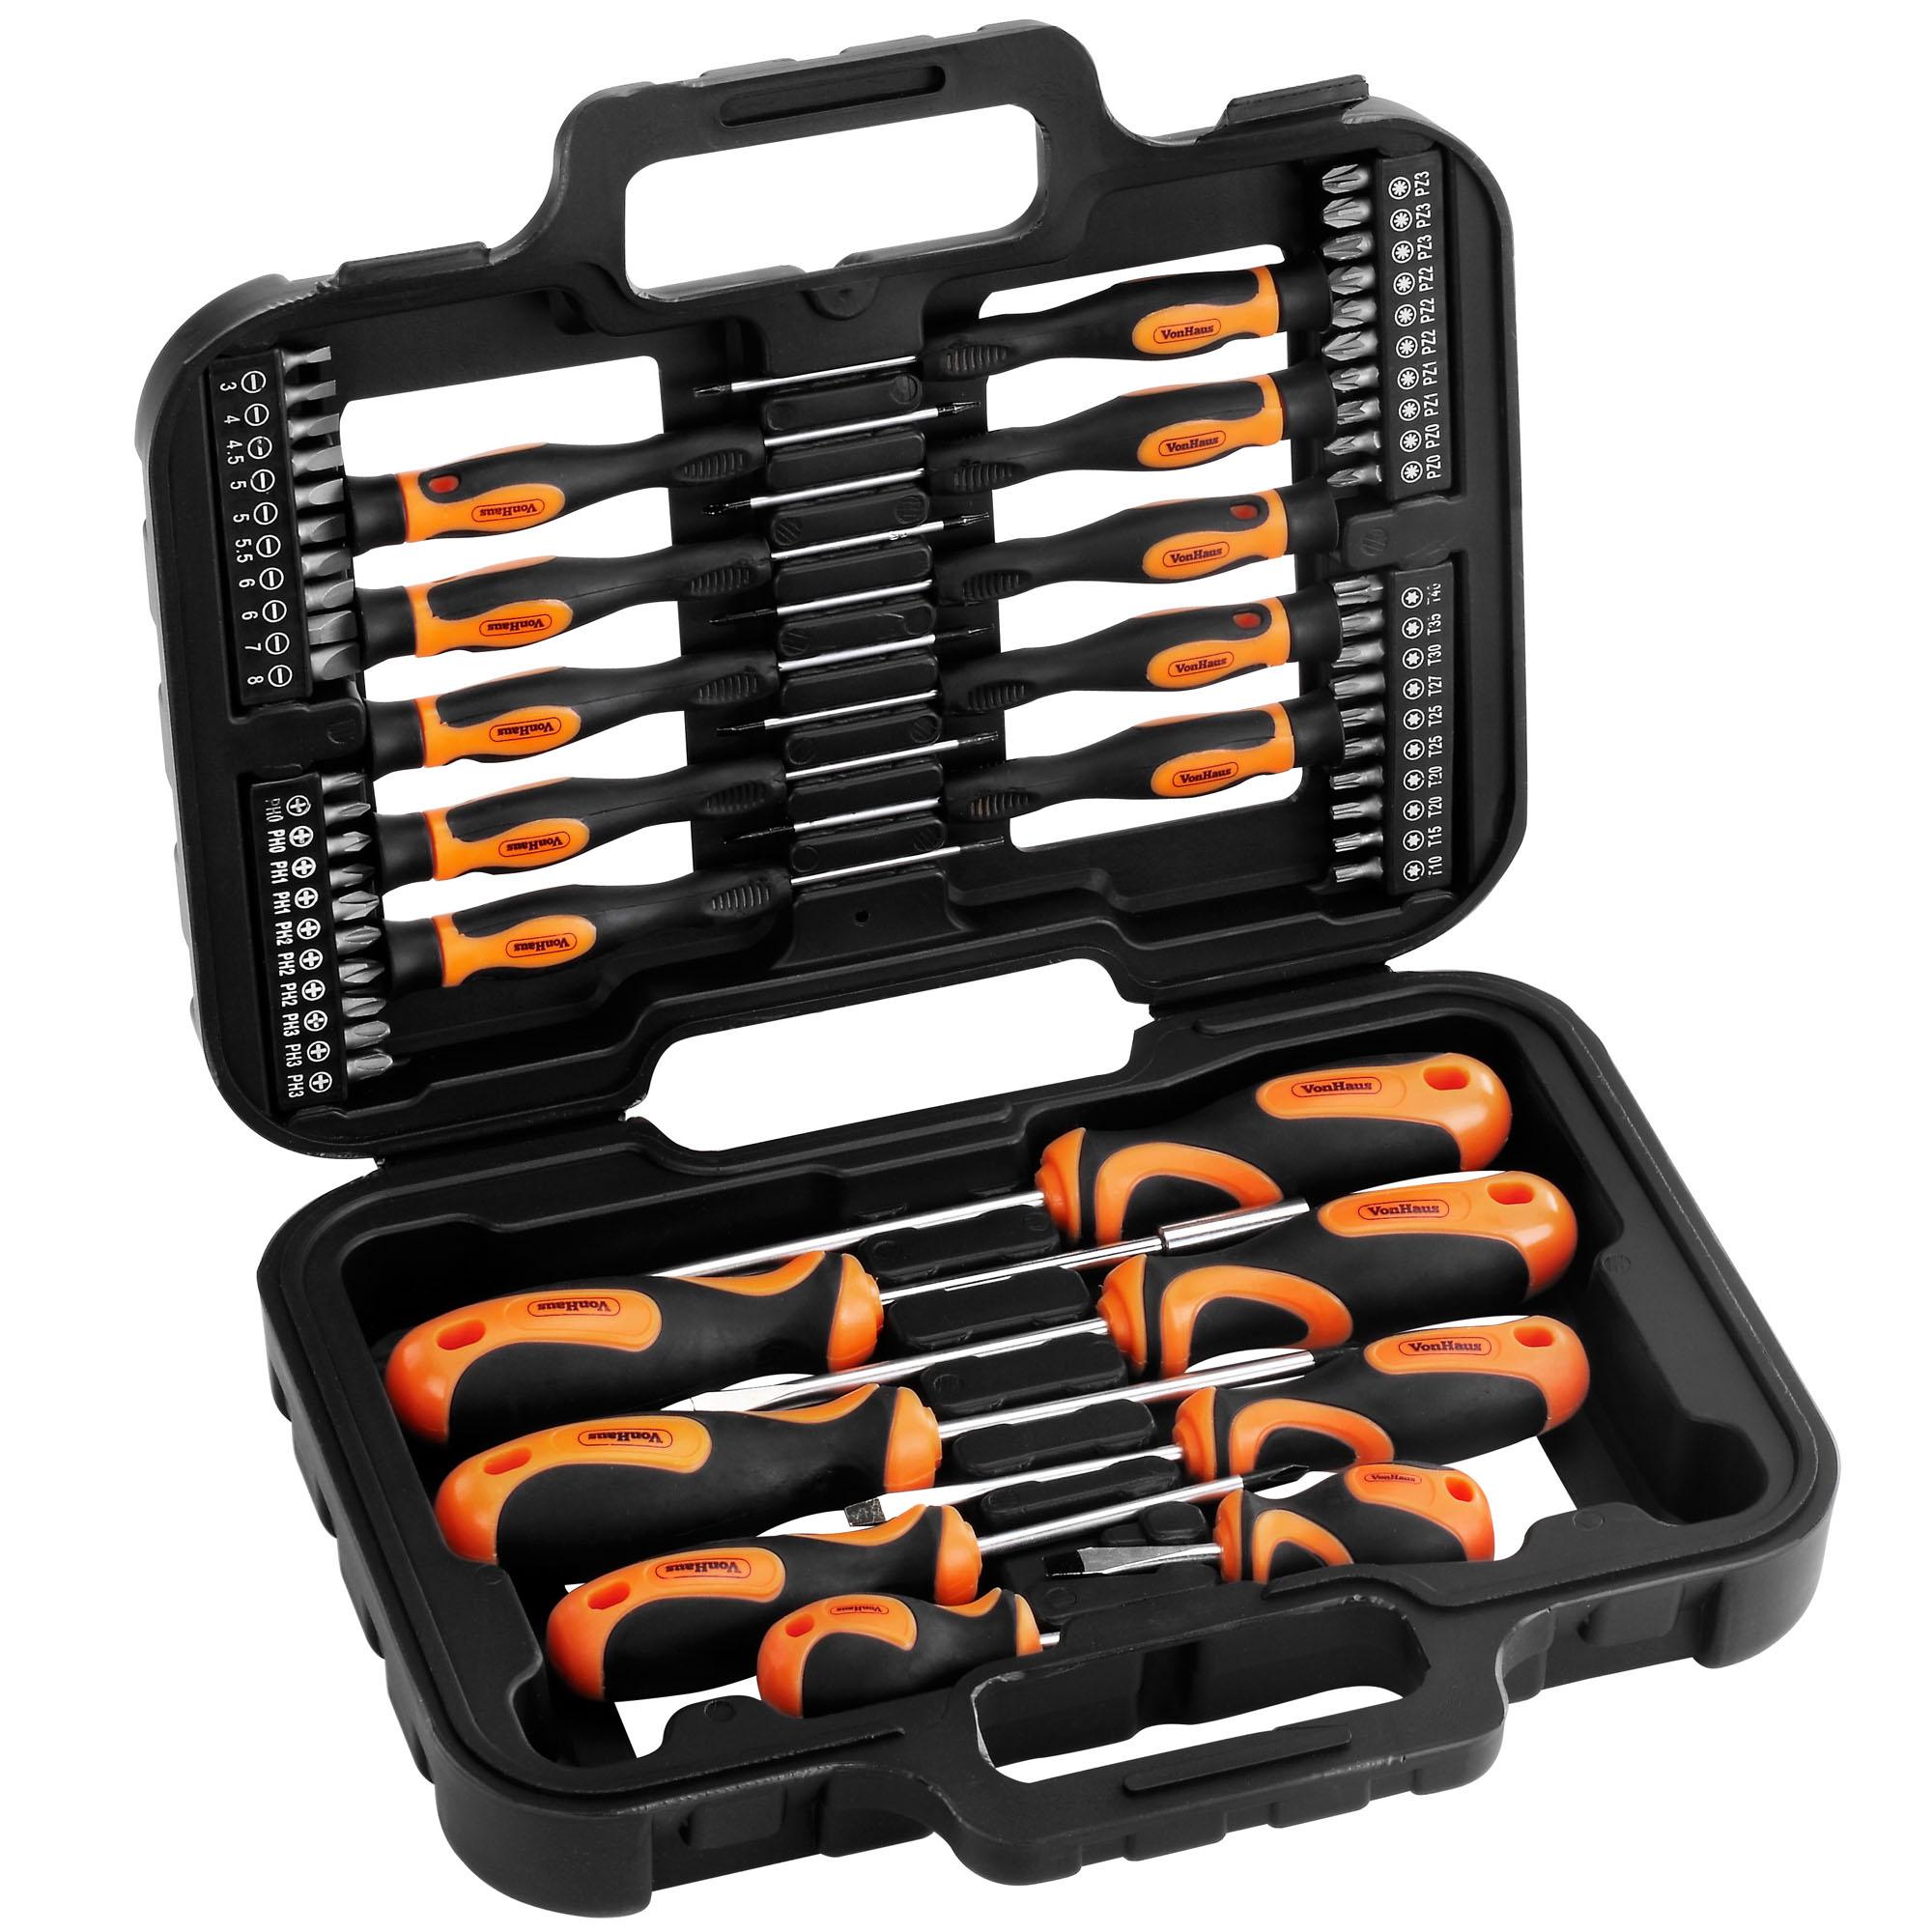 vonhaus 58pc precision screwdriver magnetic tip bits set case torx phillips pozi. Black Bedroom Furniture Sets. Home Design Ideas